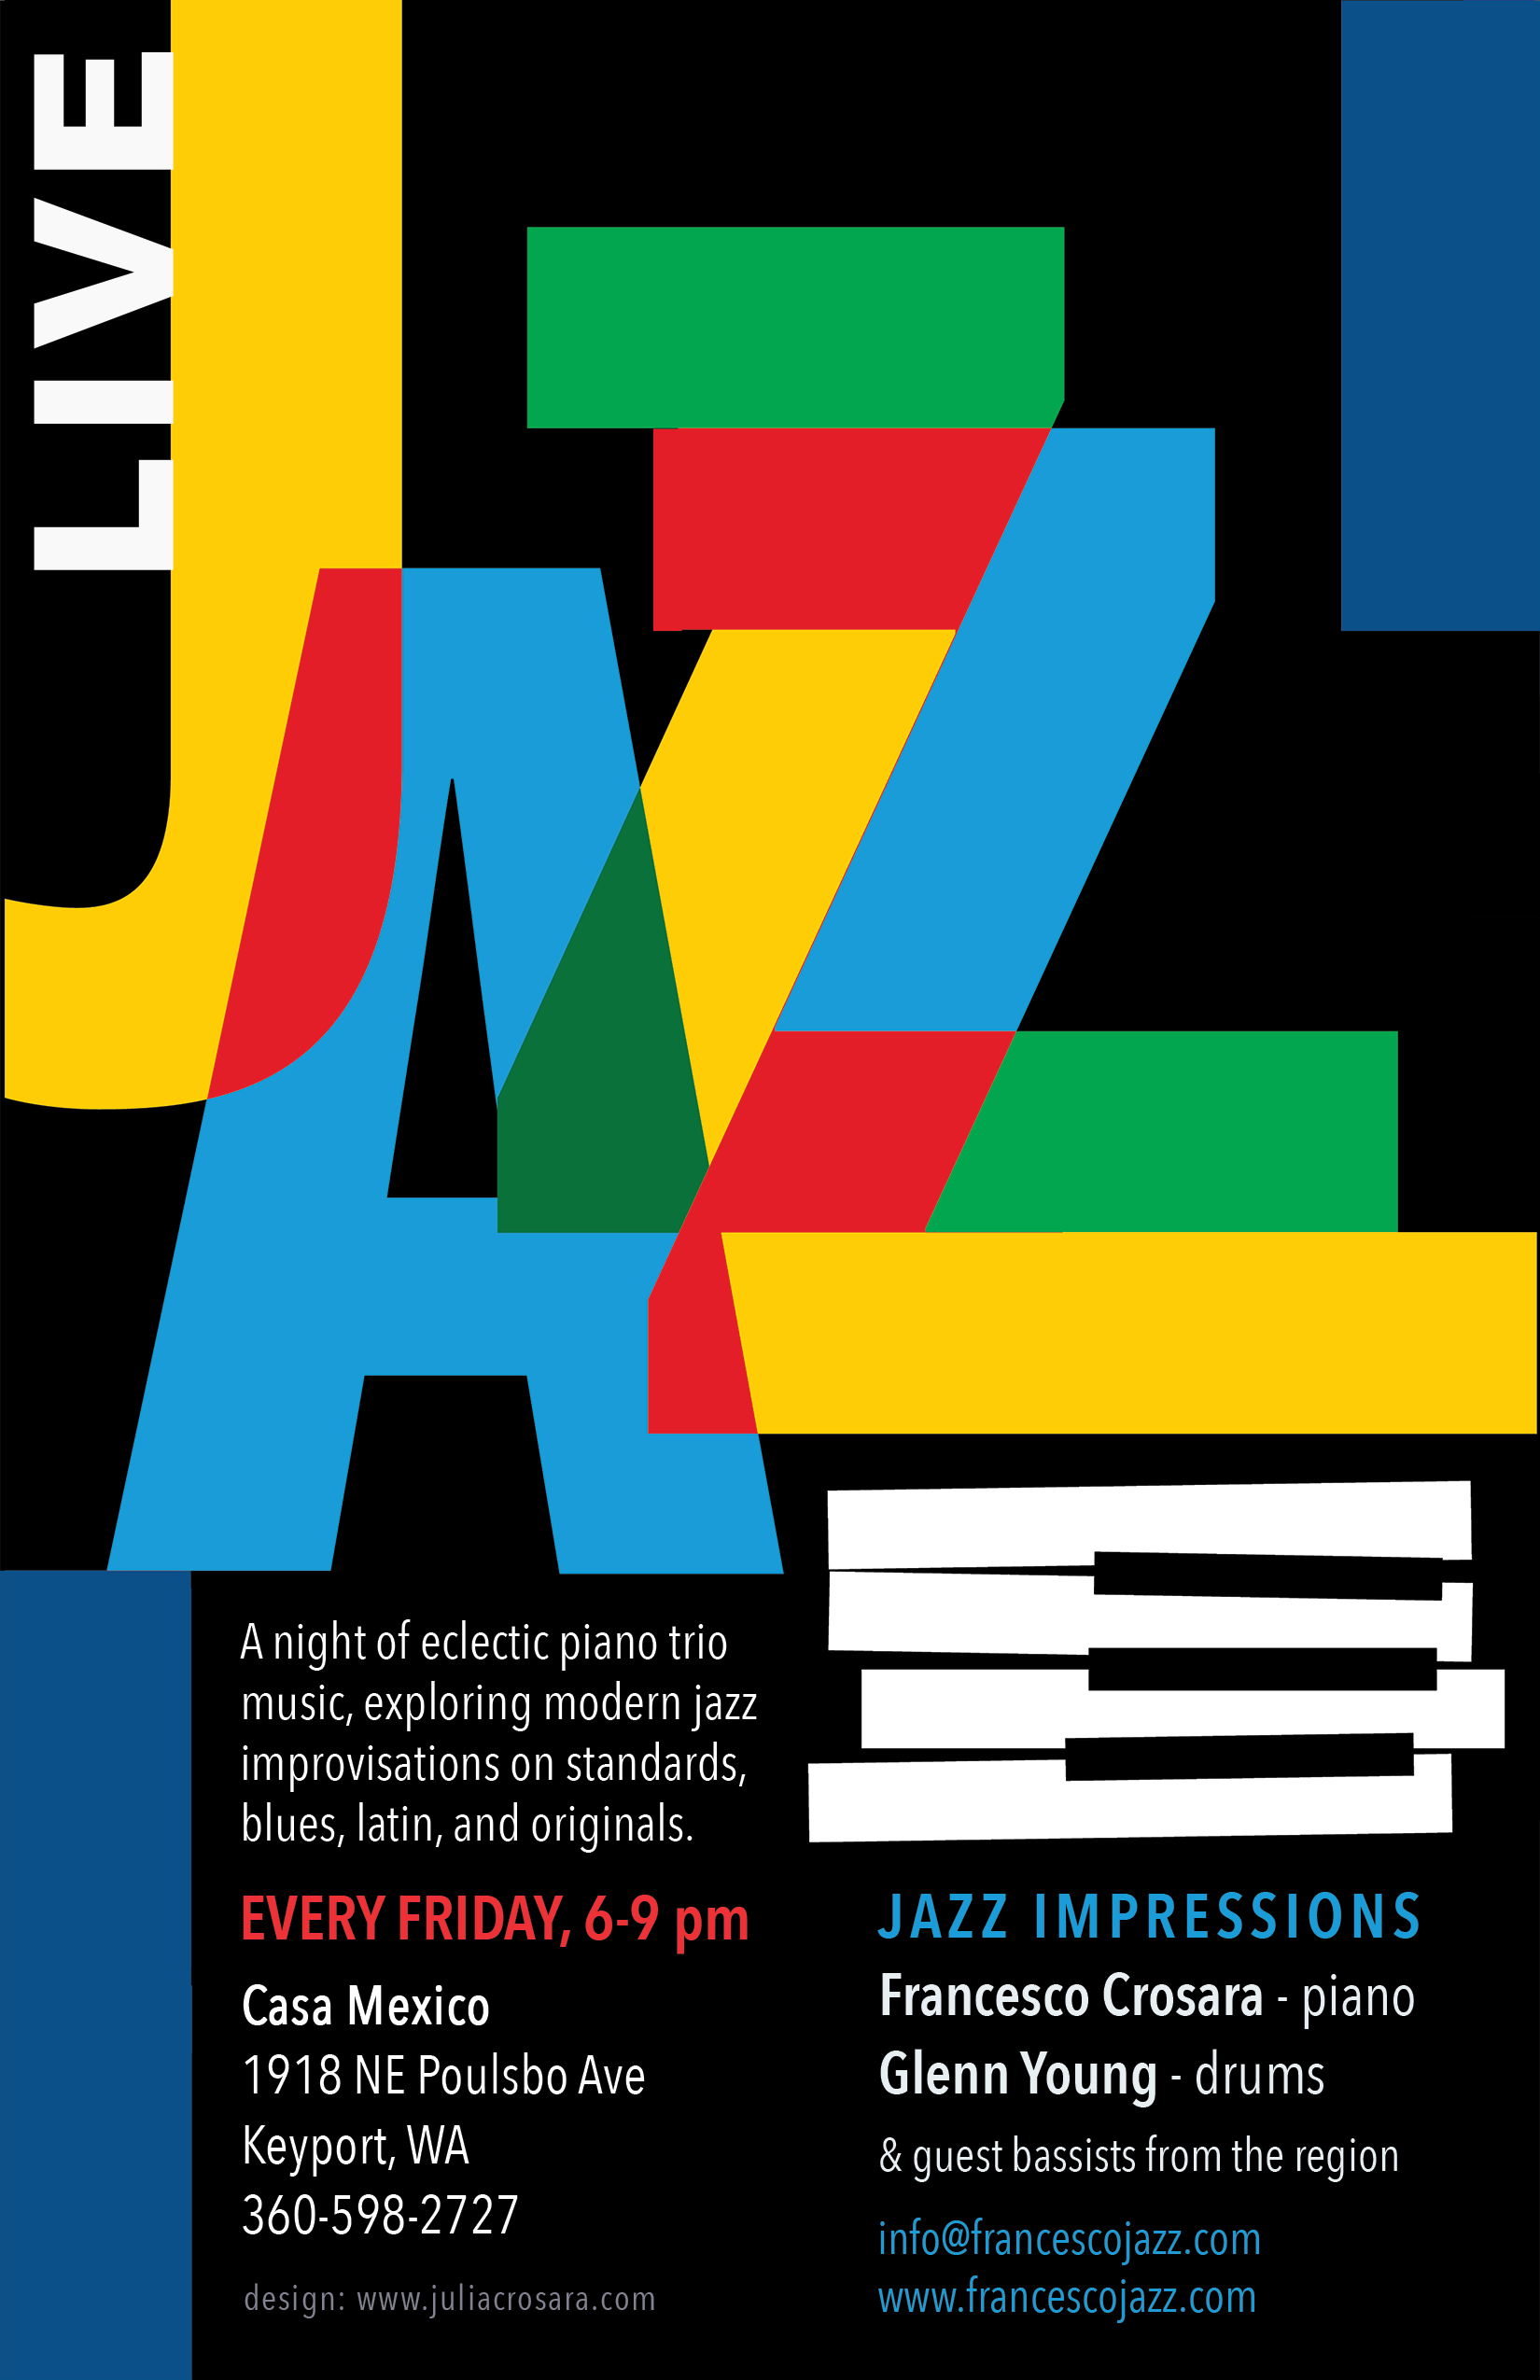 JazzImpressions_2018_permanent_poster